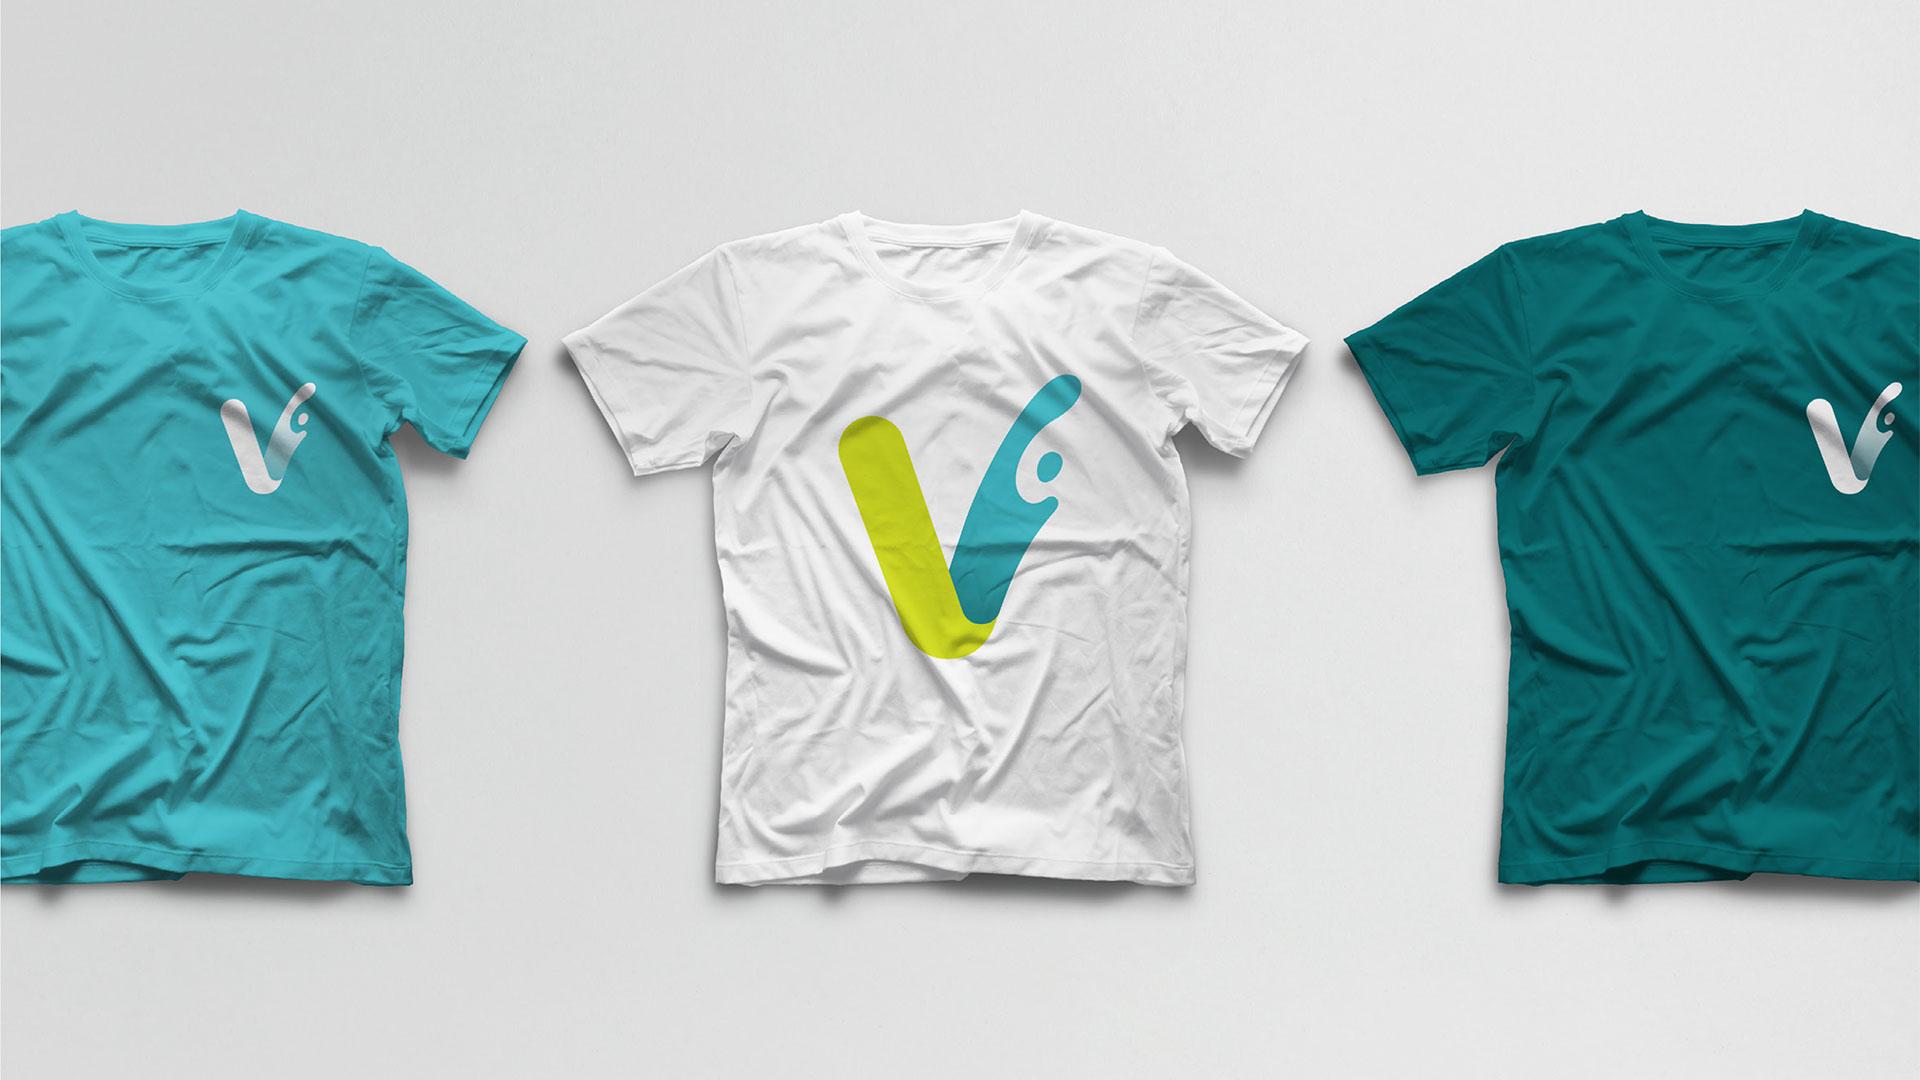 Vivere t-shirt design